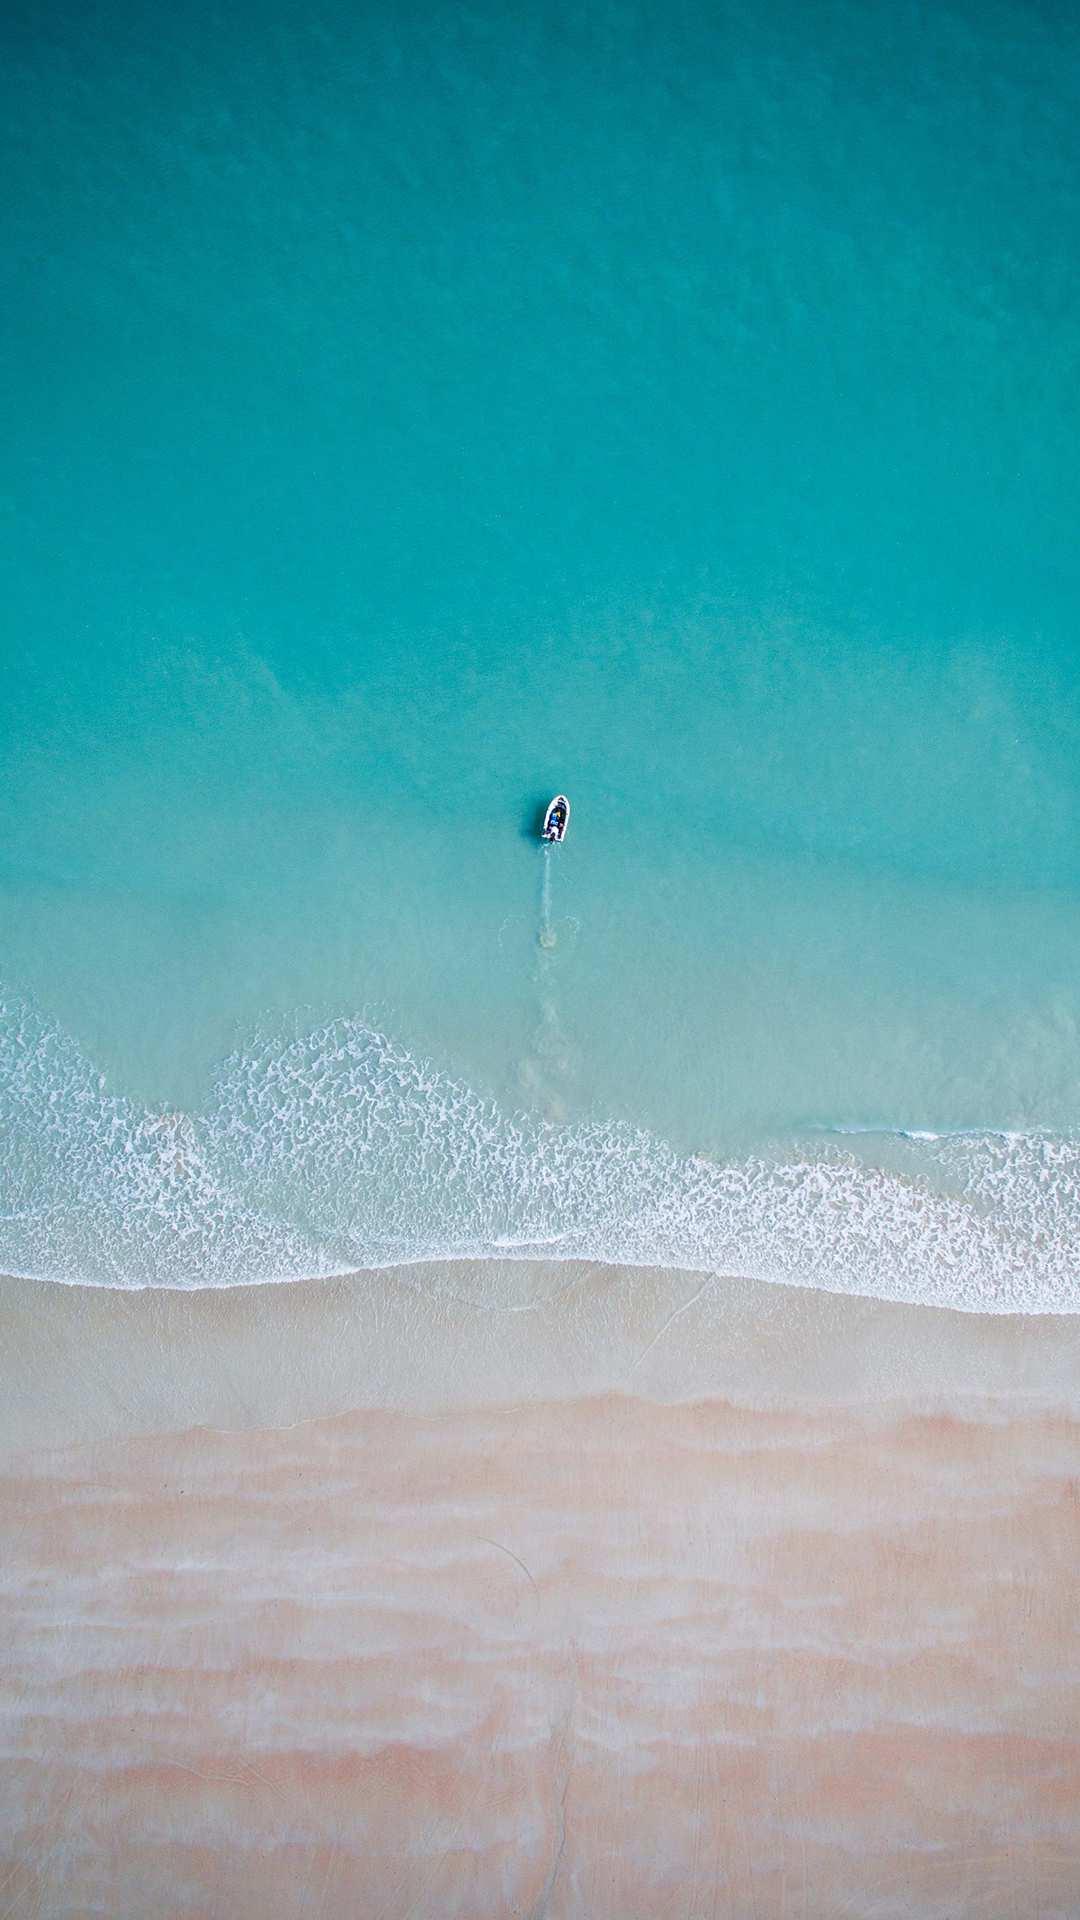 Sky View Beach Ocean Water Boat iPhone Wallpaper